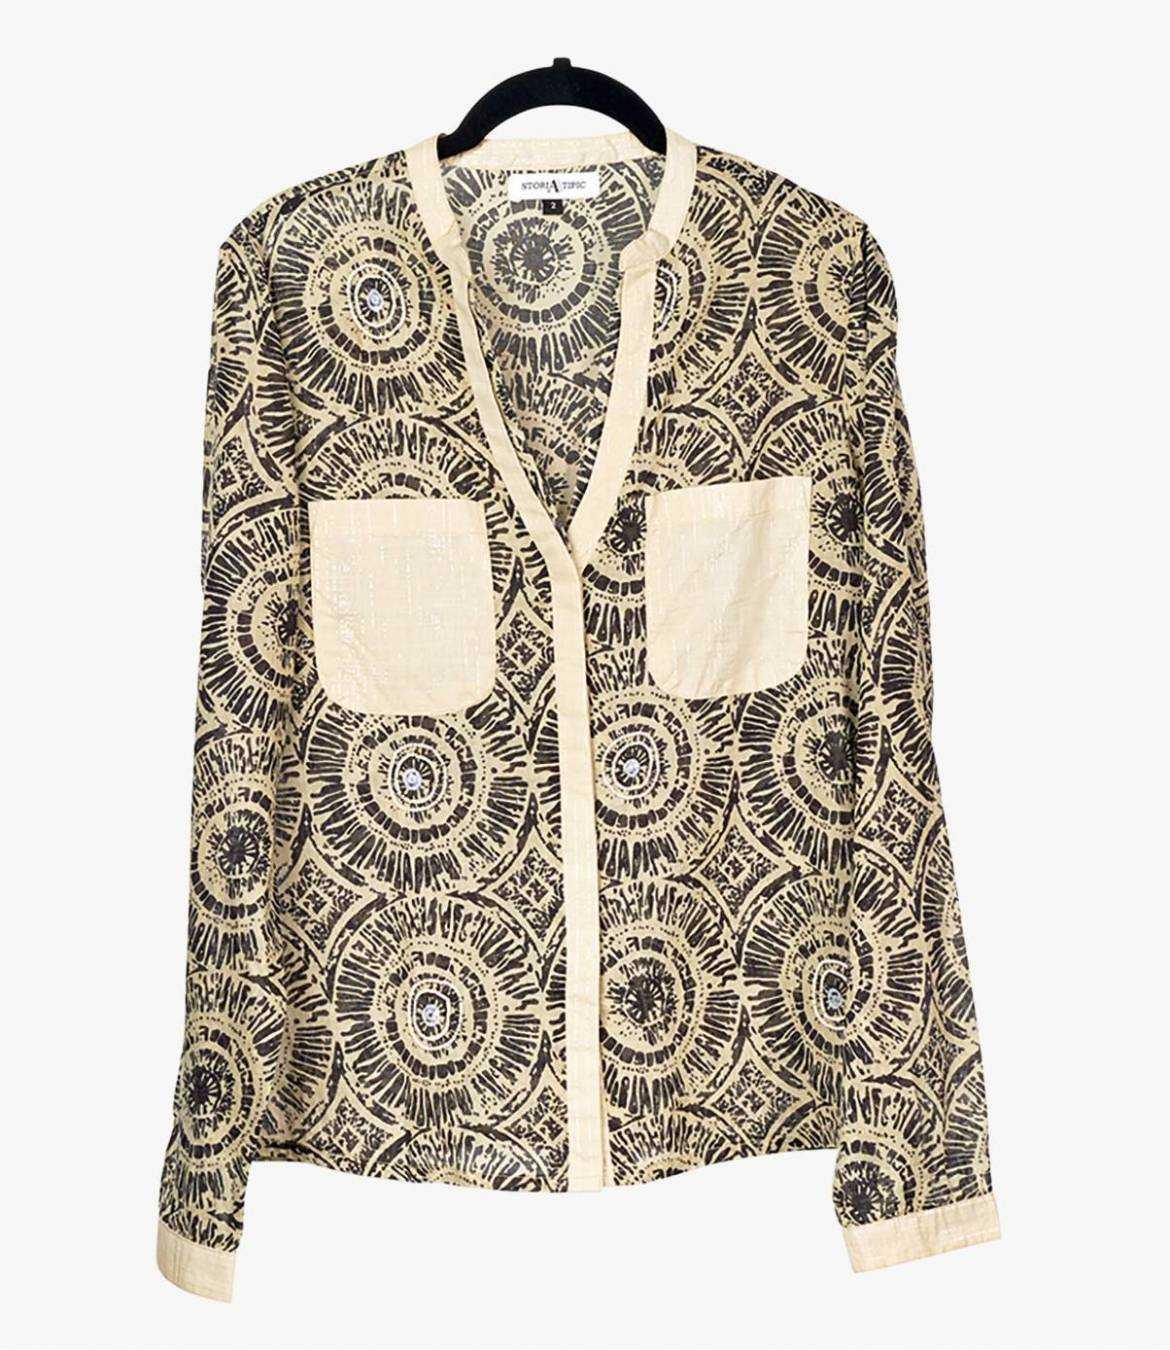 LILY SUN Cotton Blouse for Women Storiatipic - 1